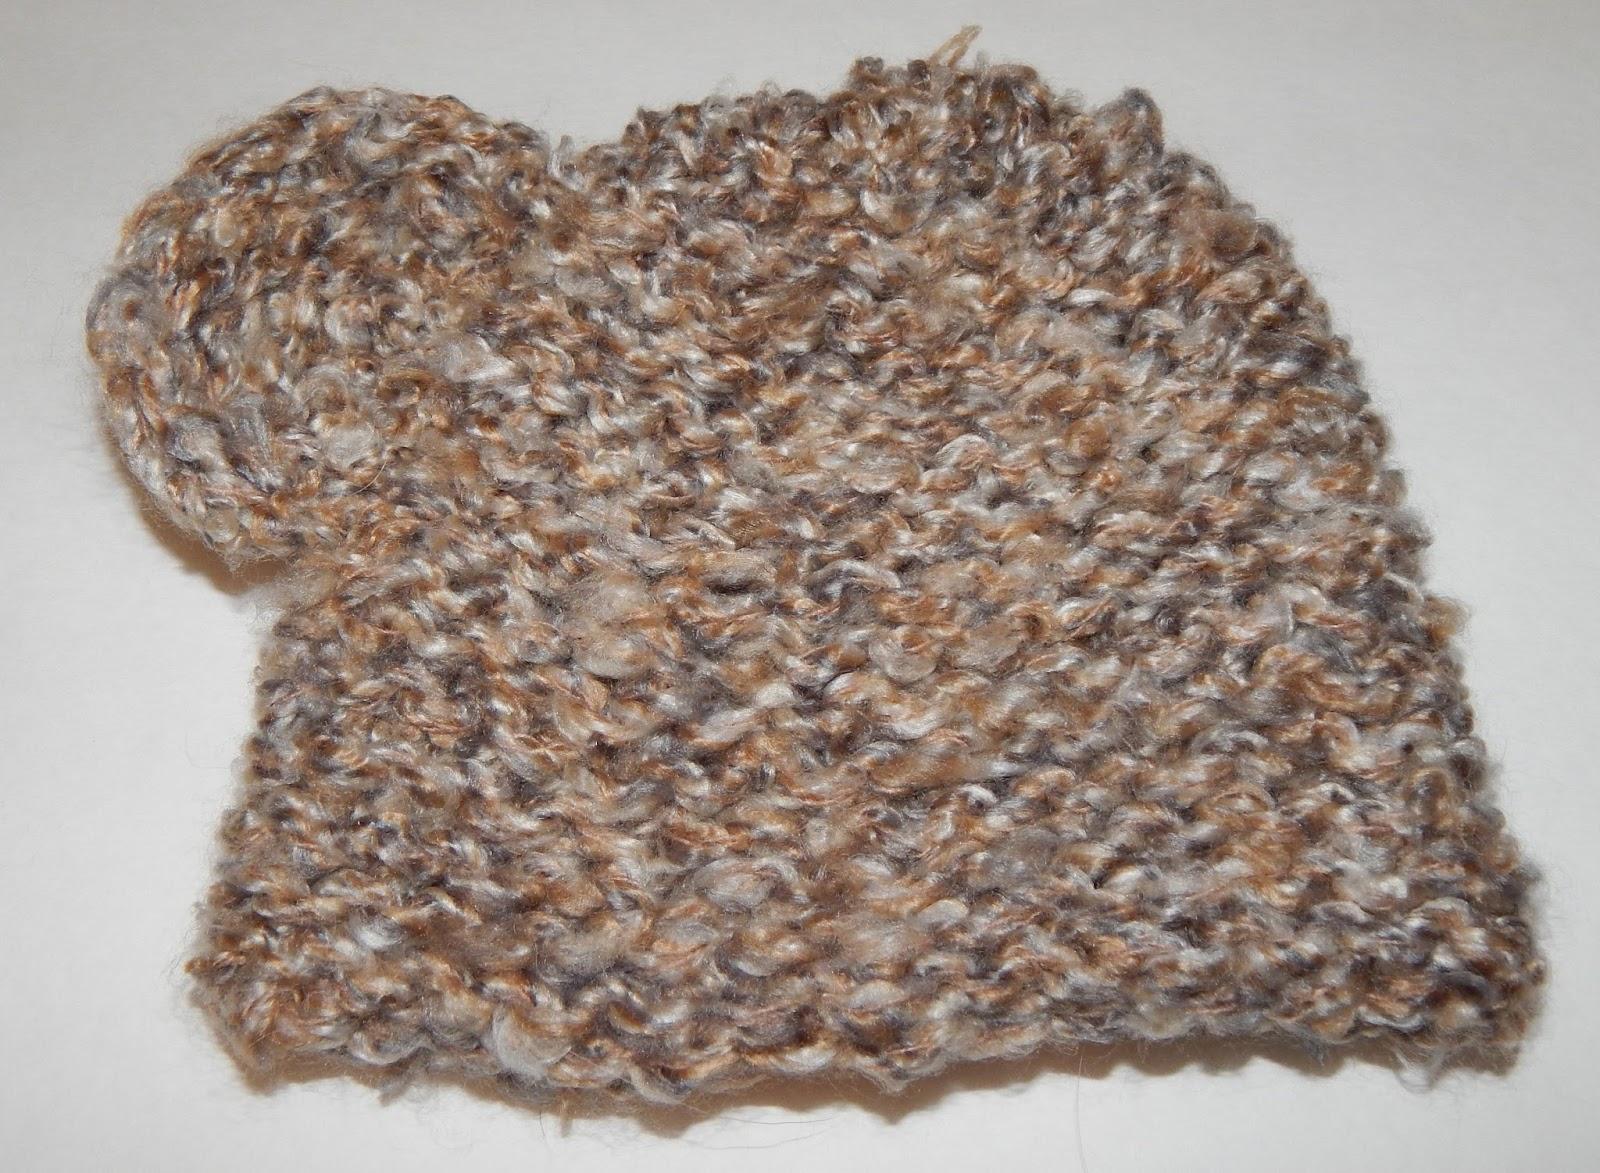 Loom Knit Baby Hat With Ears : Jovial knits loom knit baby bear hat o so cute